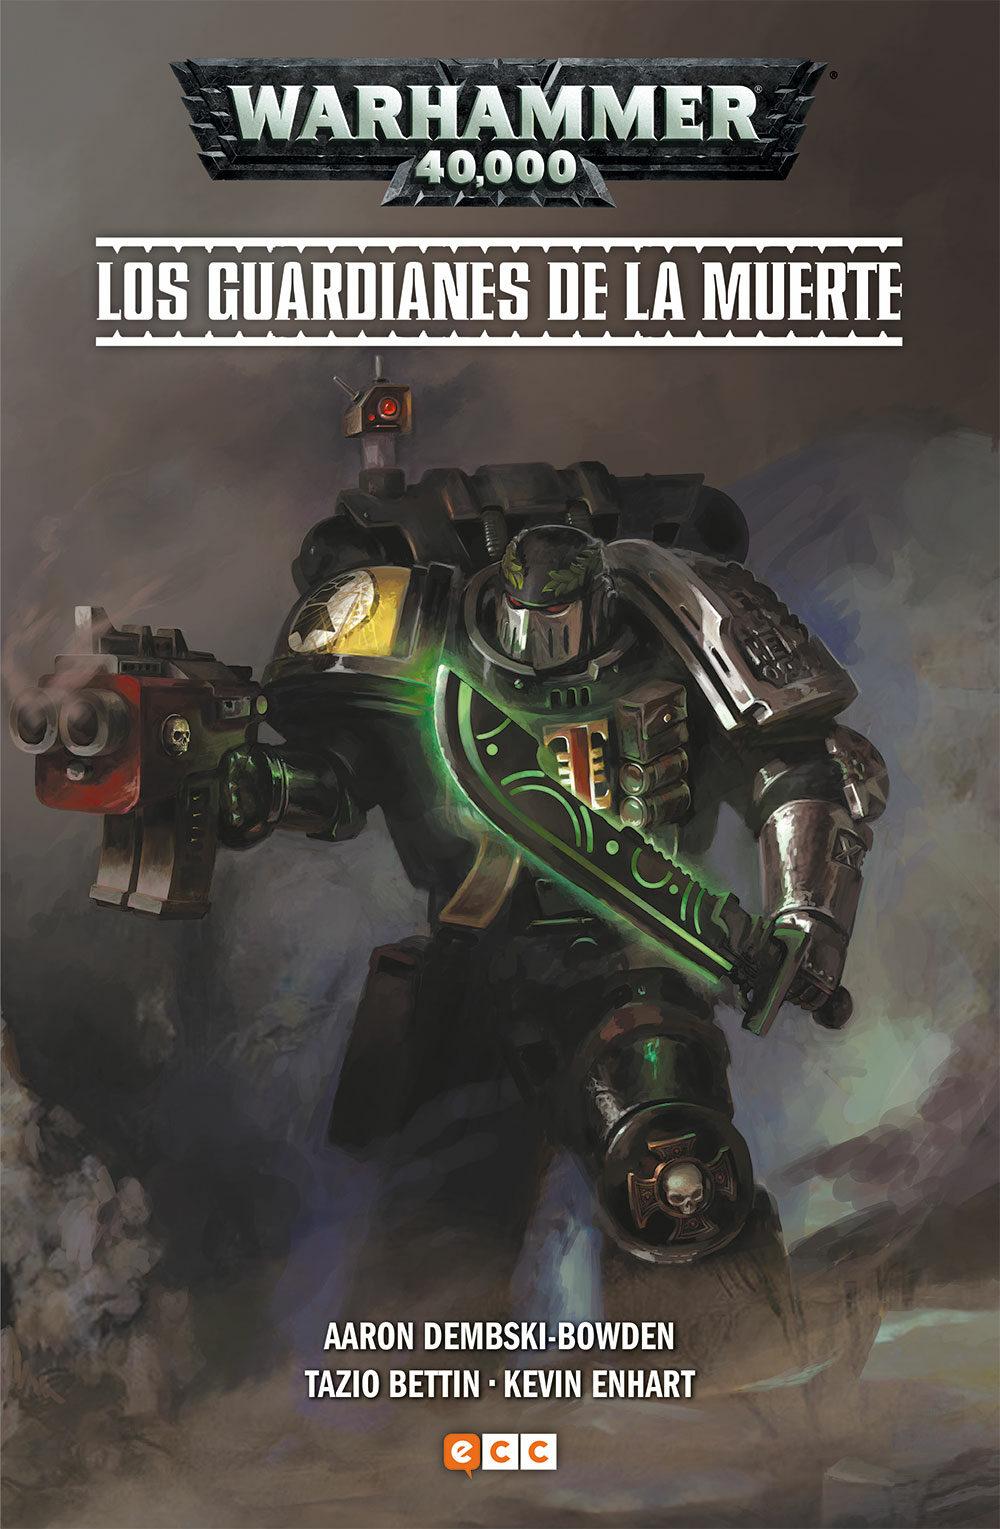 Warhammer 40000 Los Guardianes De La Muerte - Dempski-bowden Aaron